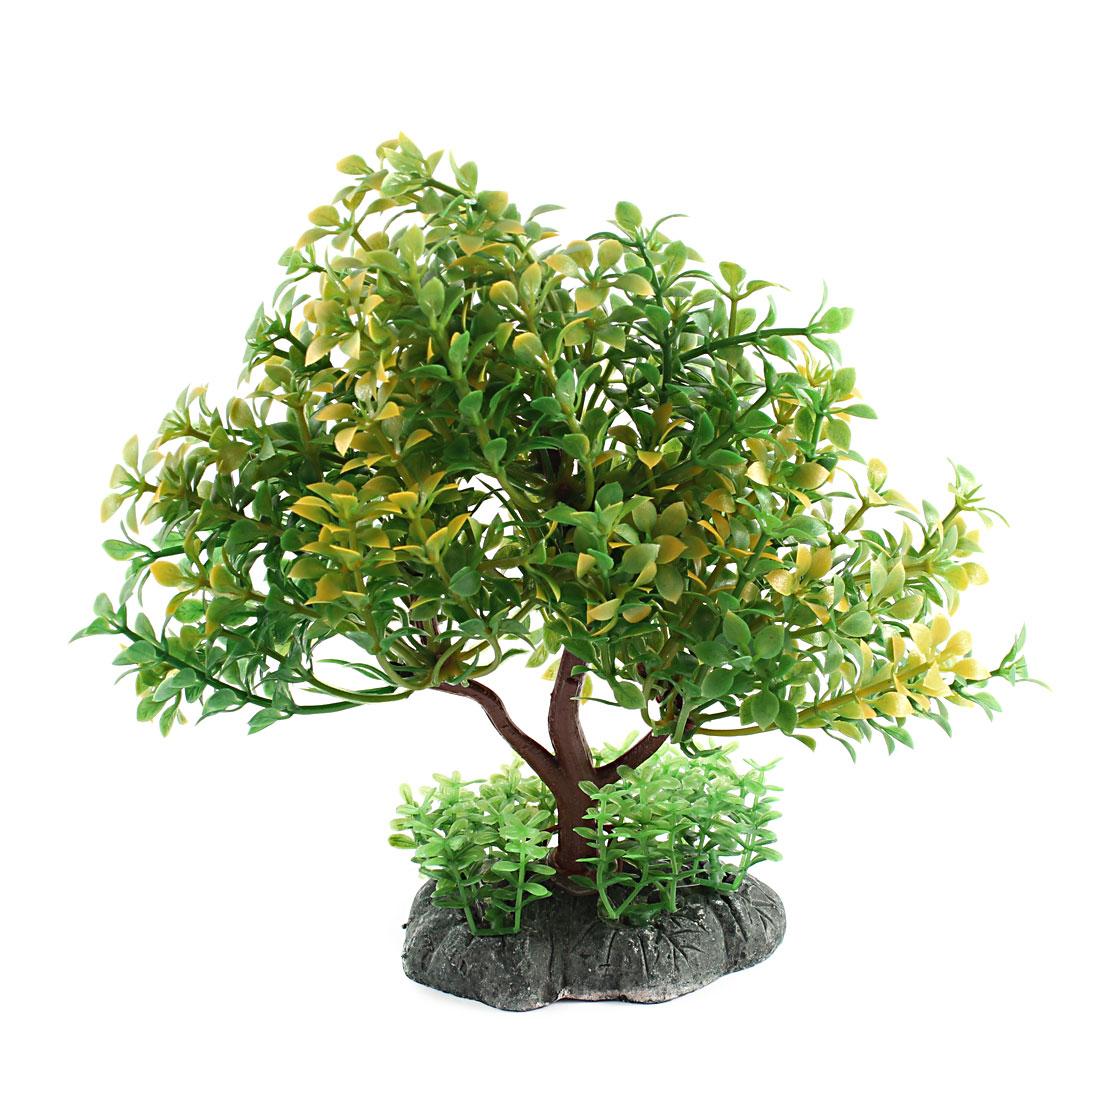 "Simulated Plastic Aquarium Tank Grass Plant Ornament 7.1"" Height Green"